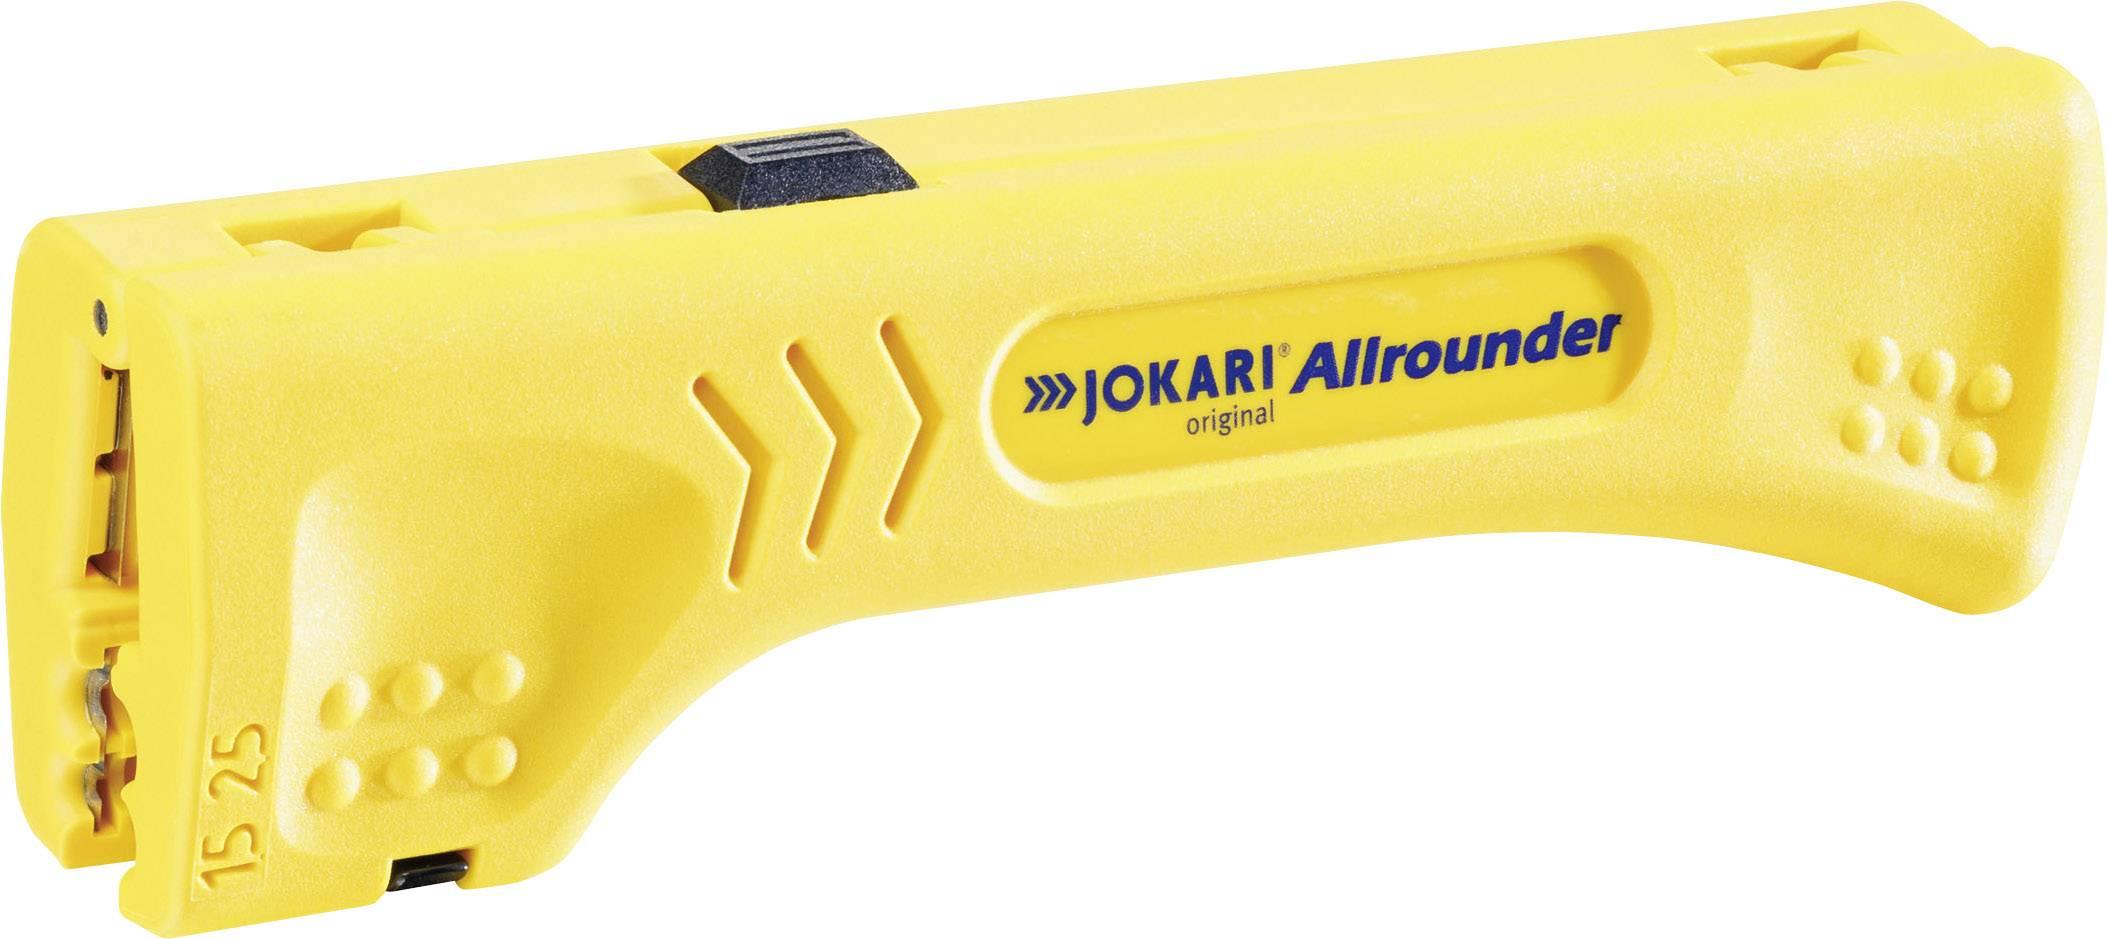 Odizolovač Jokari Allrounder 30900, 4 do 15 mm, 1.5 do 50 mm²